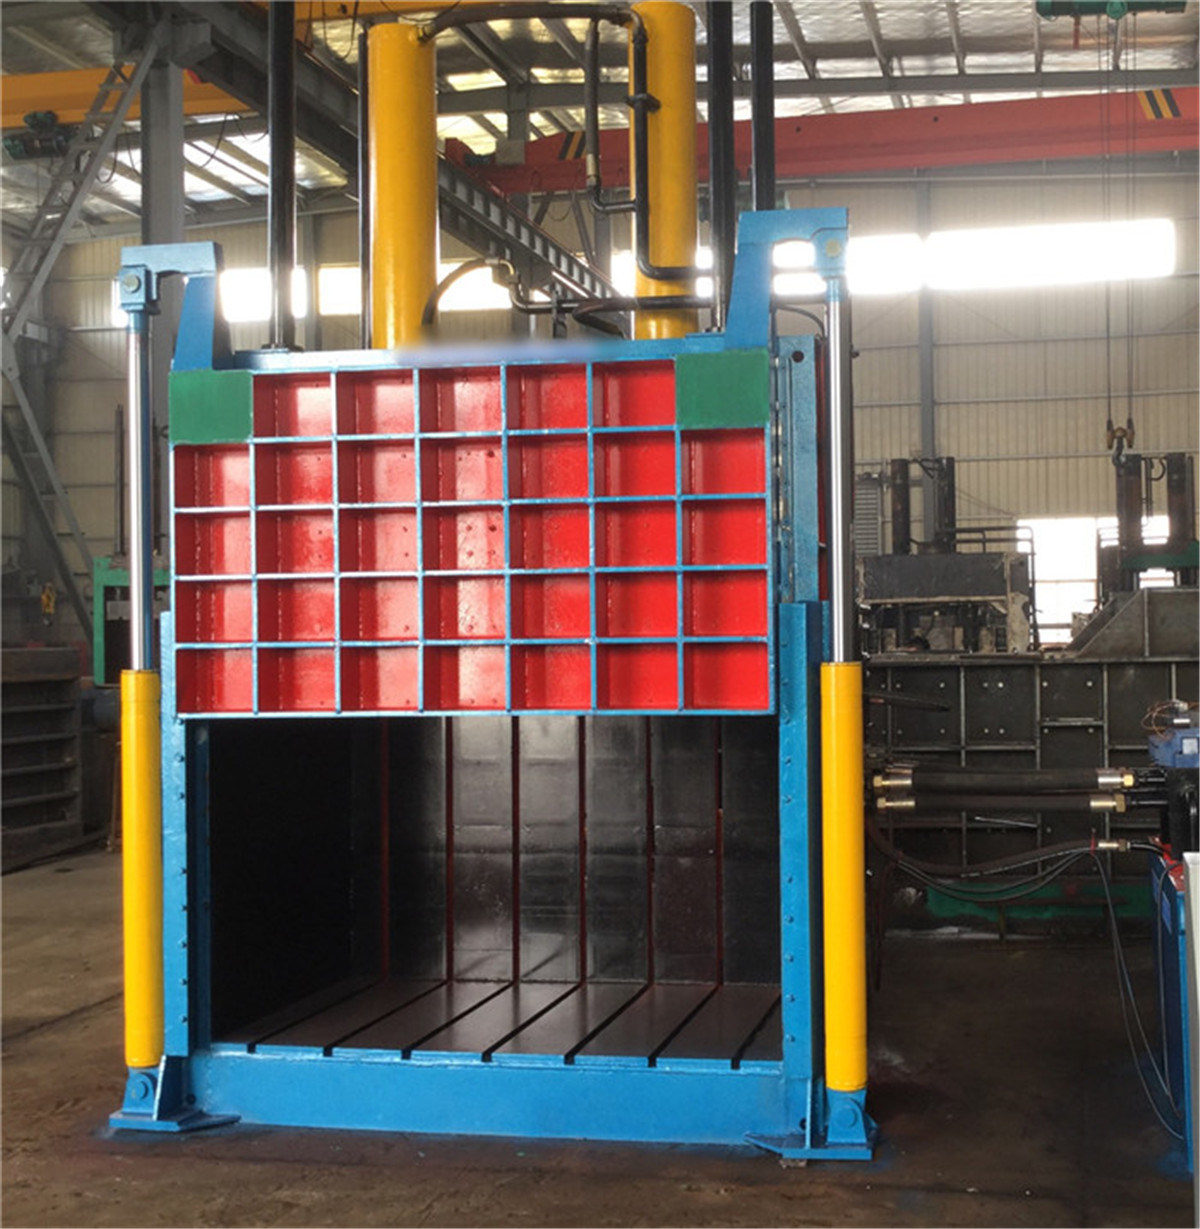 Y82-100 Vertical Packing Machine